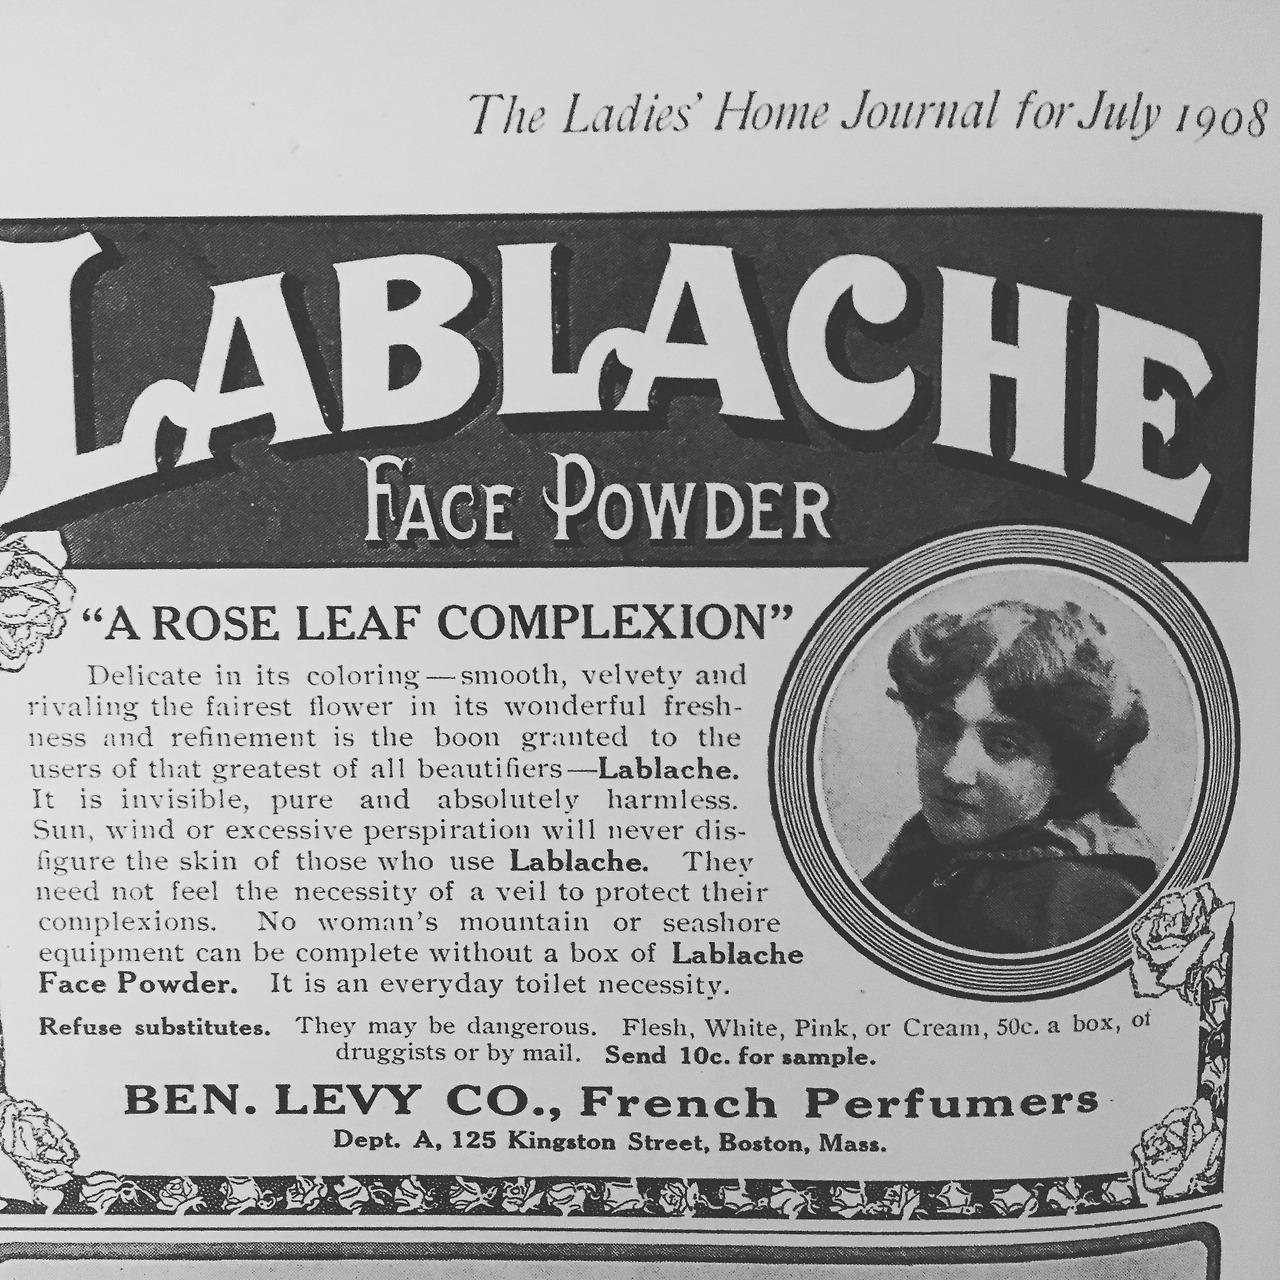 Lablache Face Powder.  Ladies' Home Journal. July 1908.